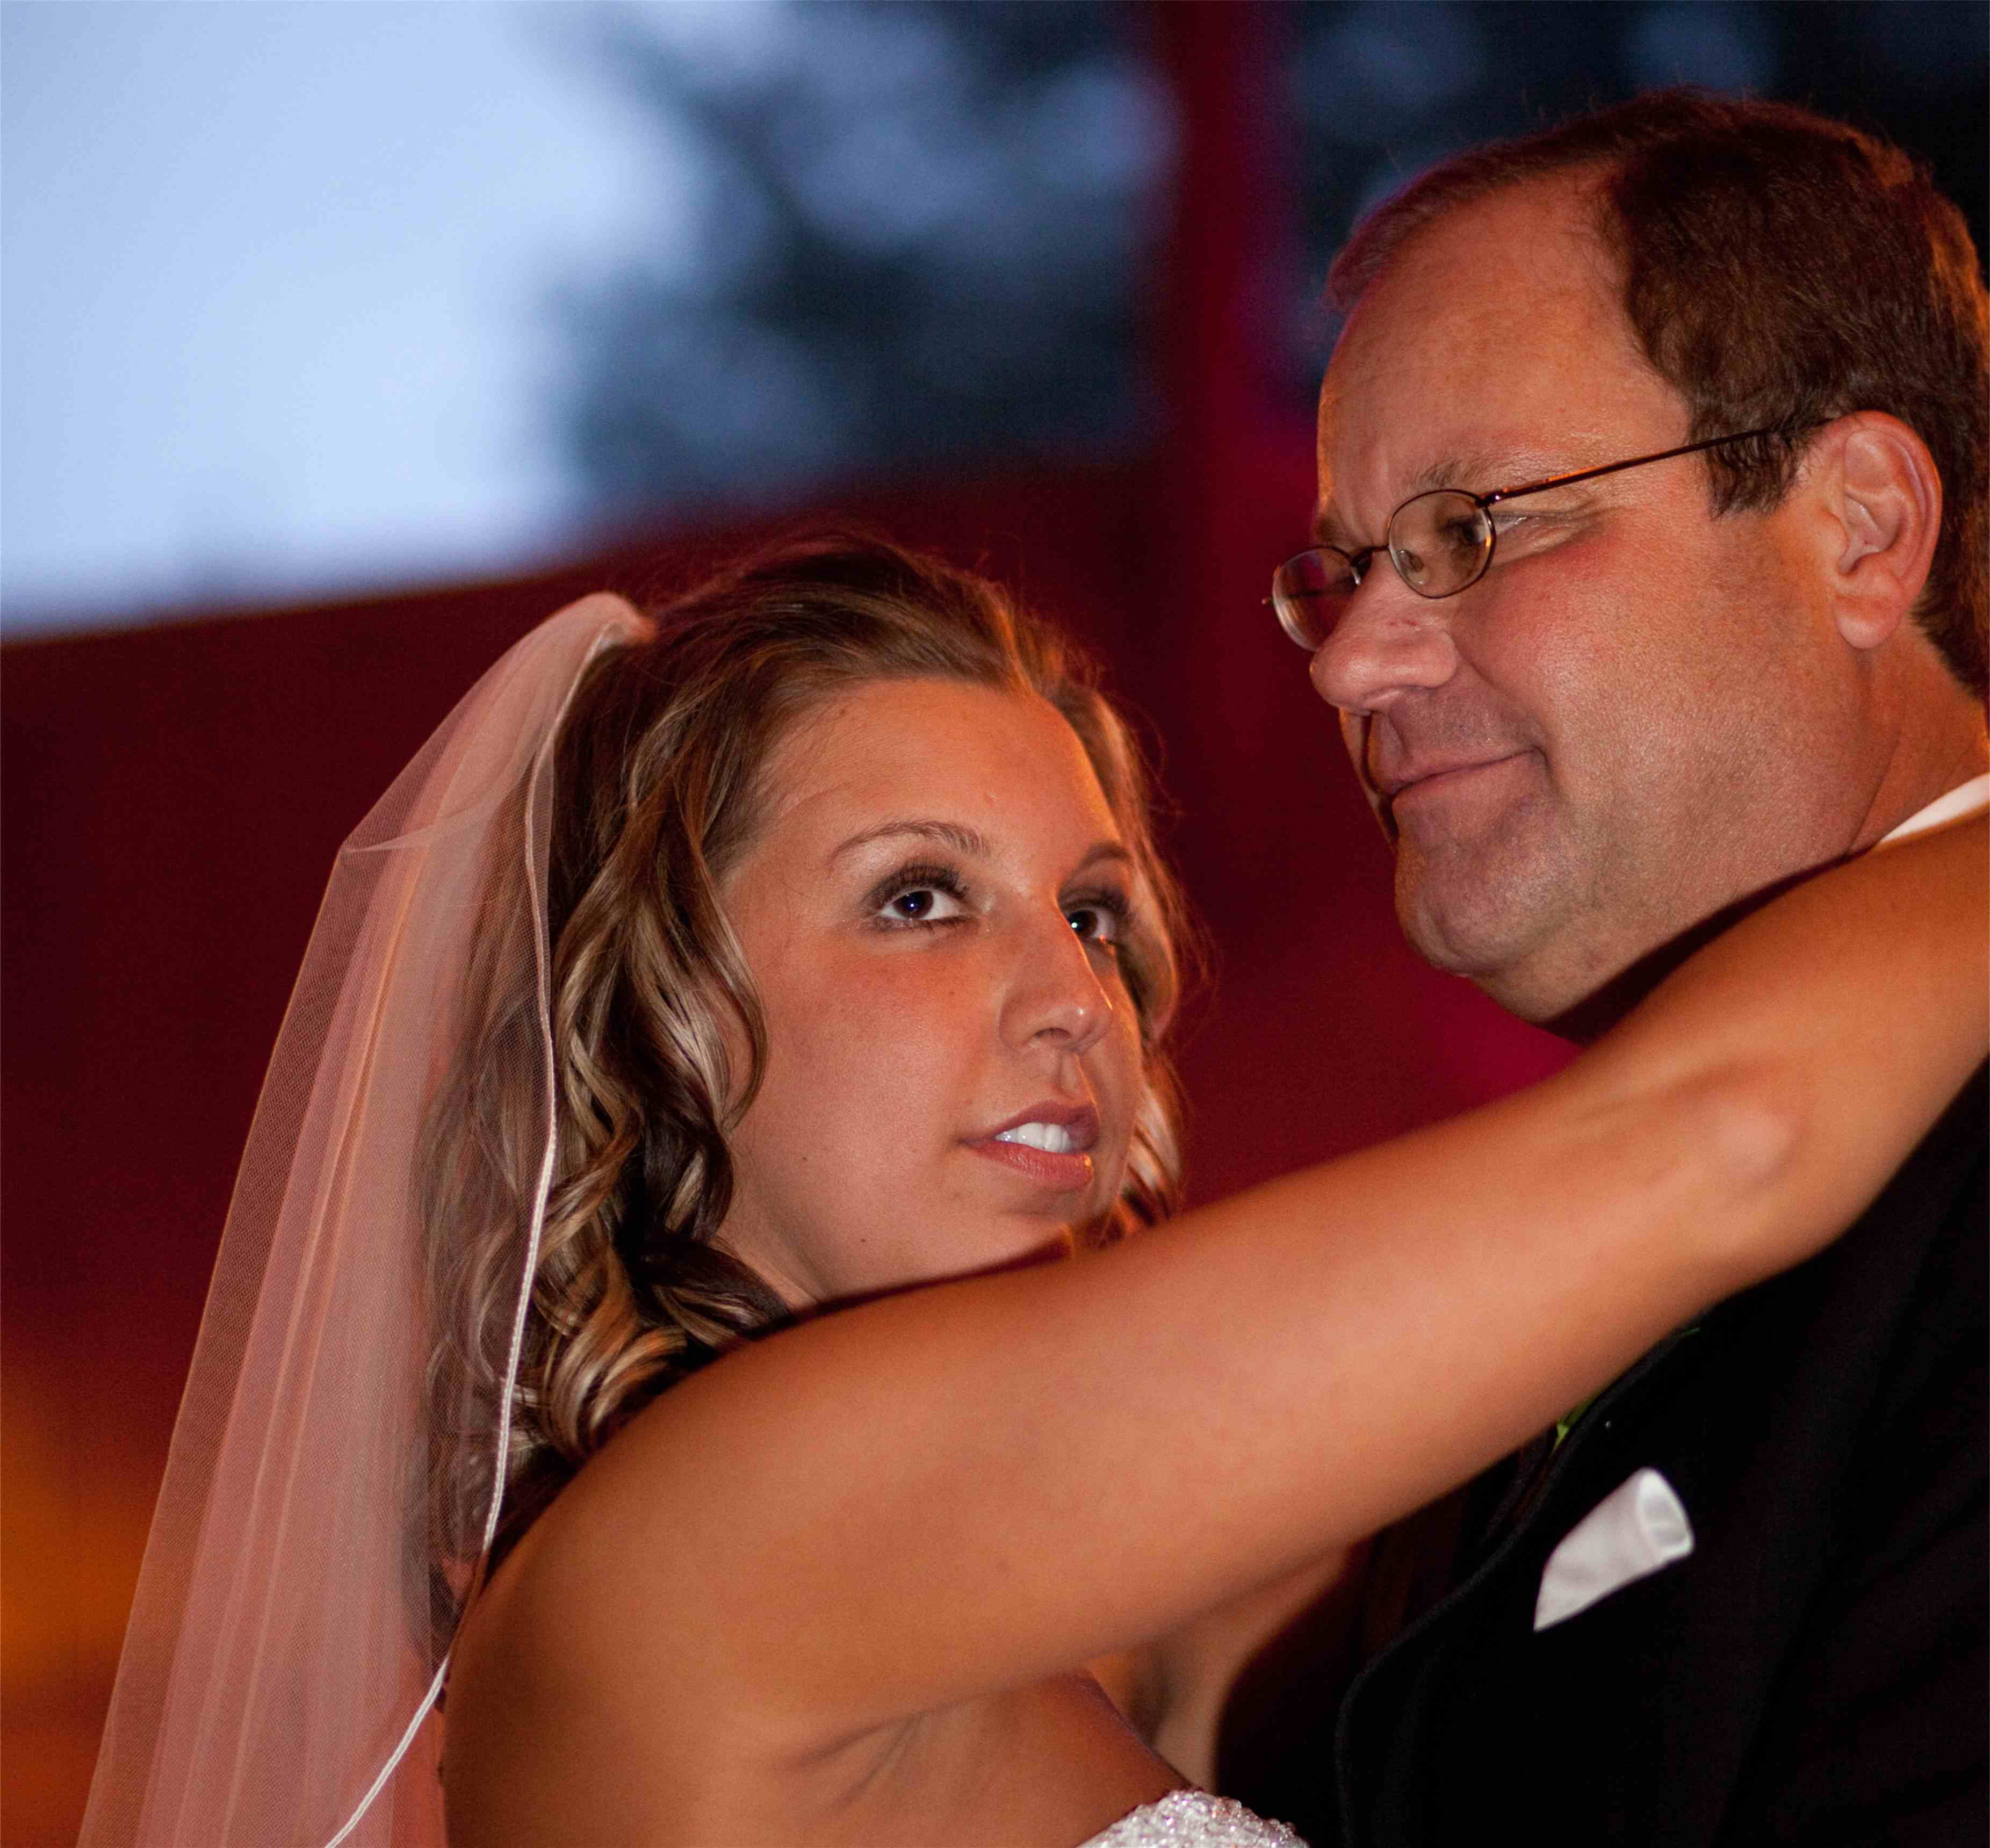 Wedding Dance Song Ideas: 20 Father Daughter Wedding Dance Song Ideas